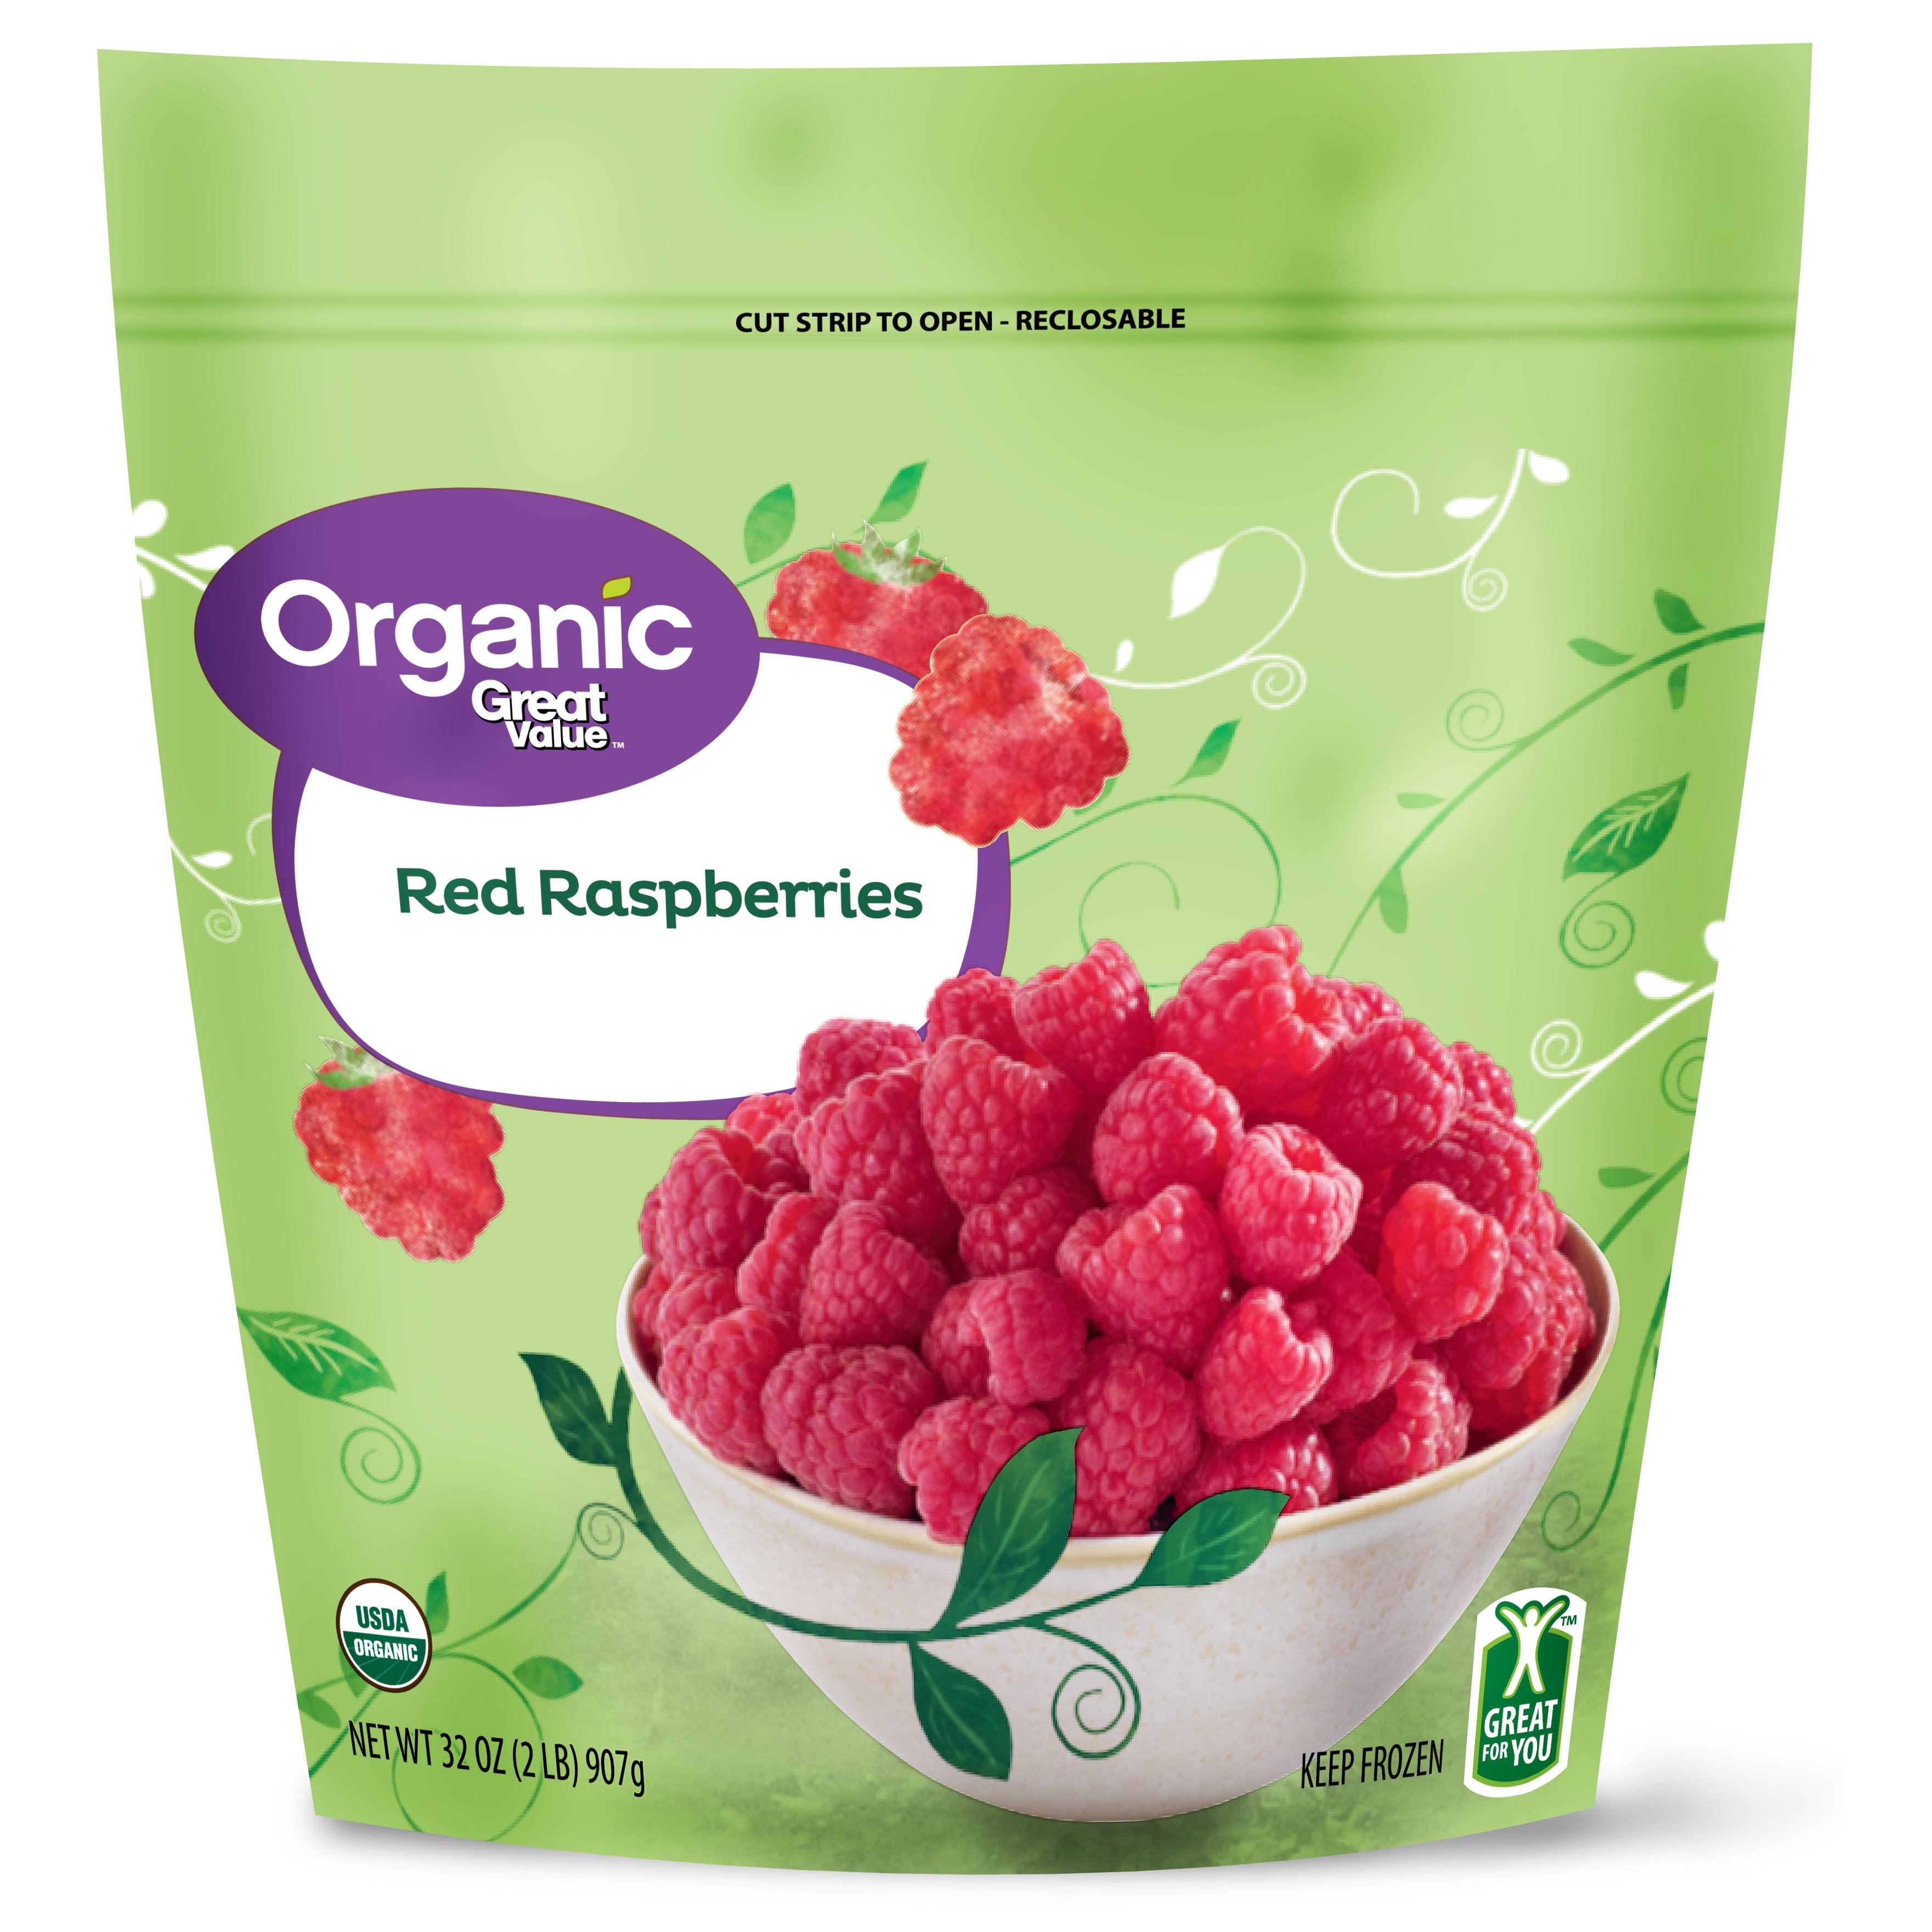 Great Value Organic Red Raspberries, 2 lbs